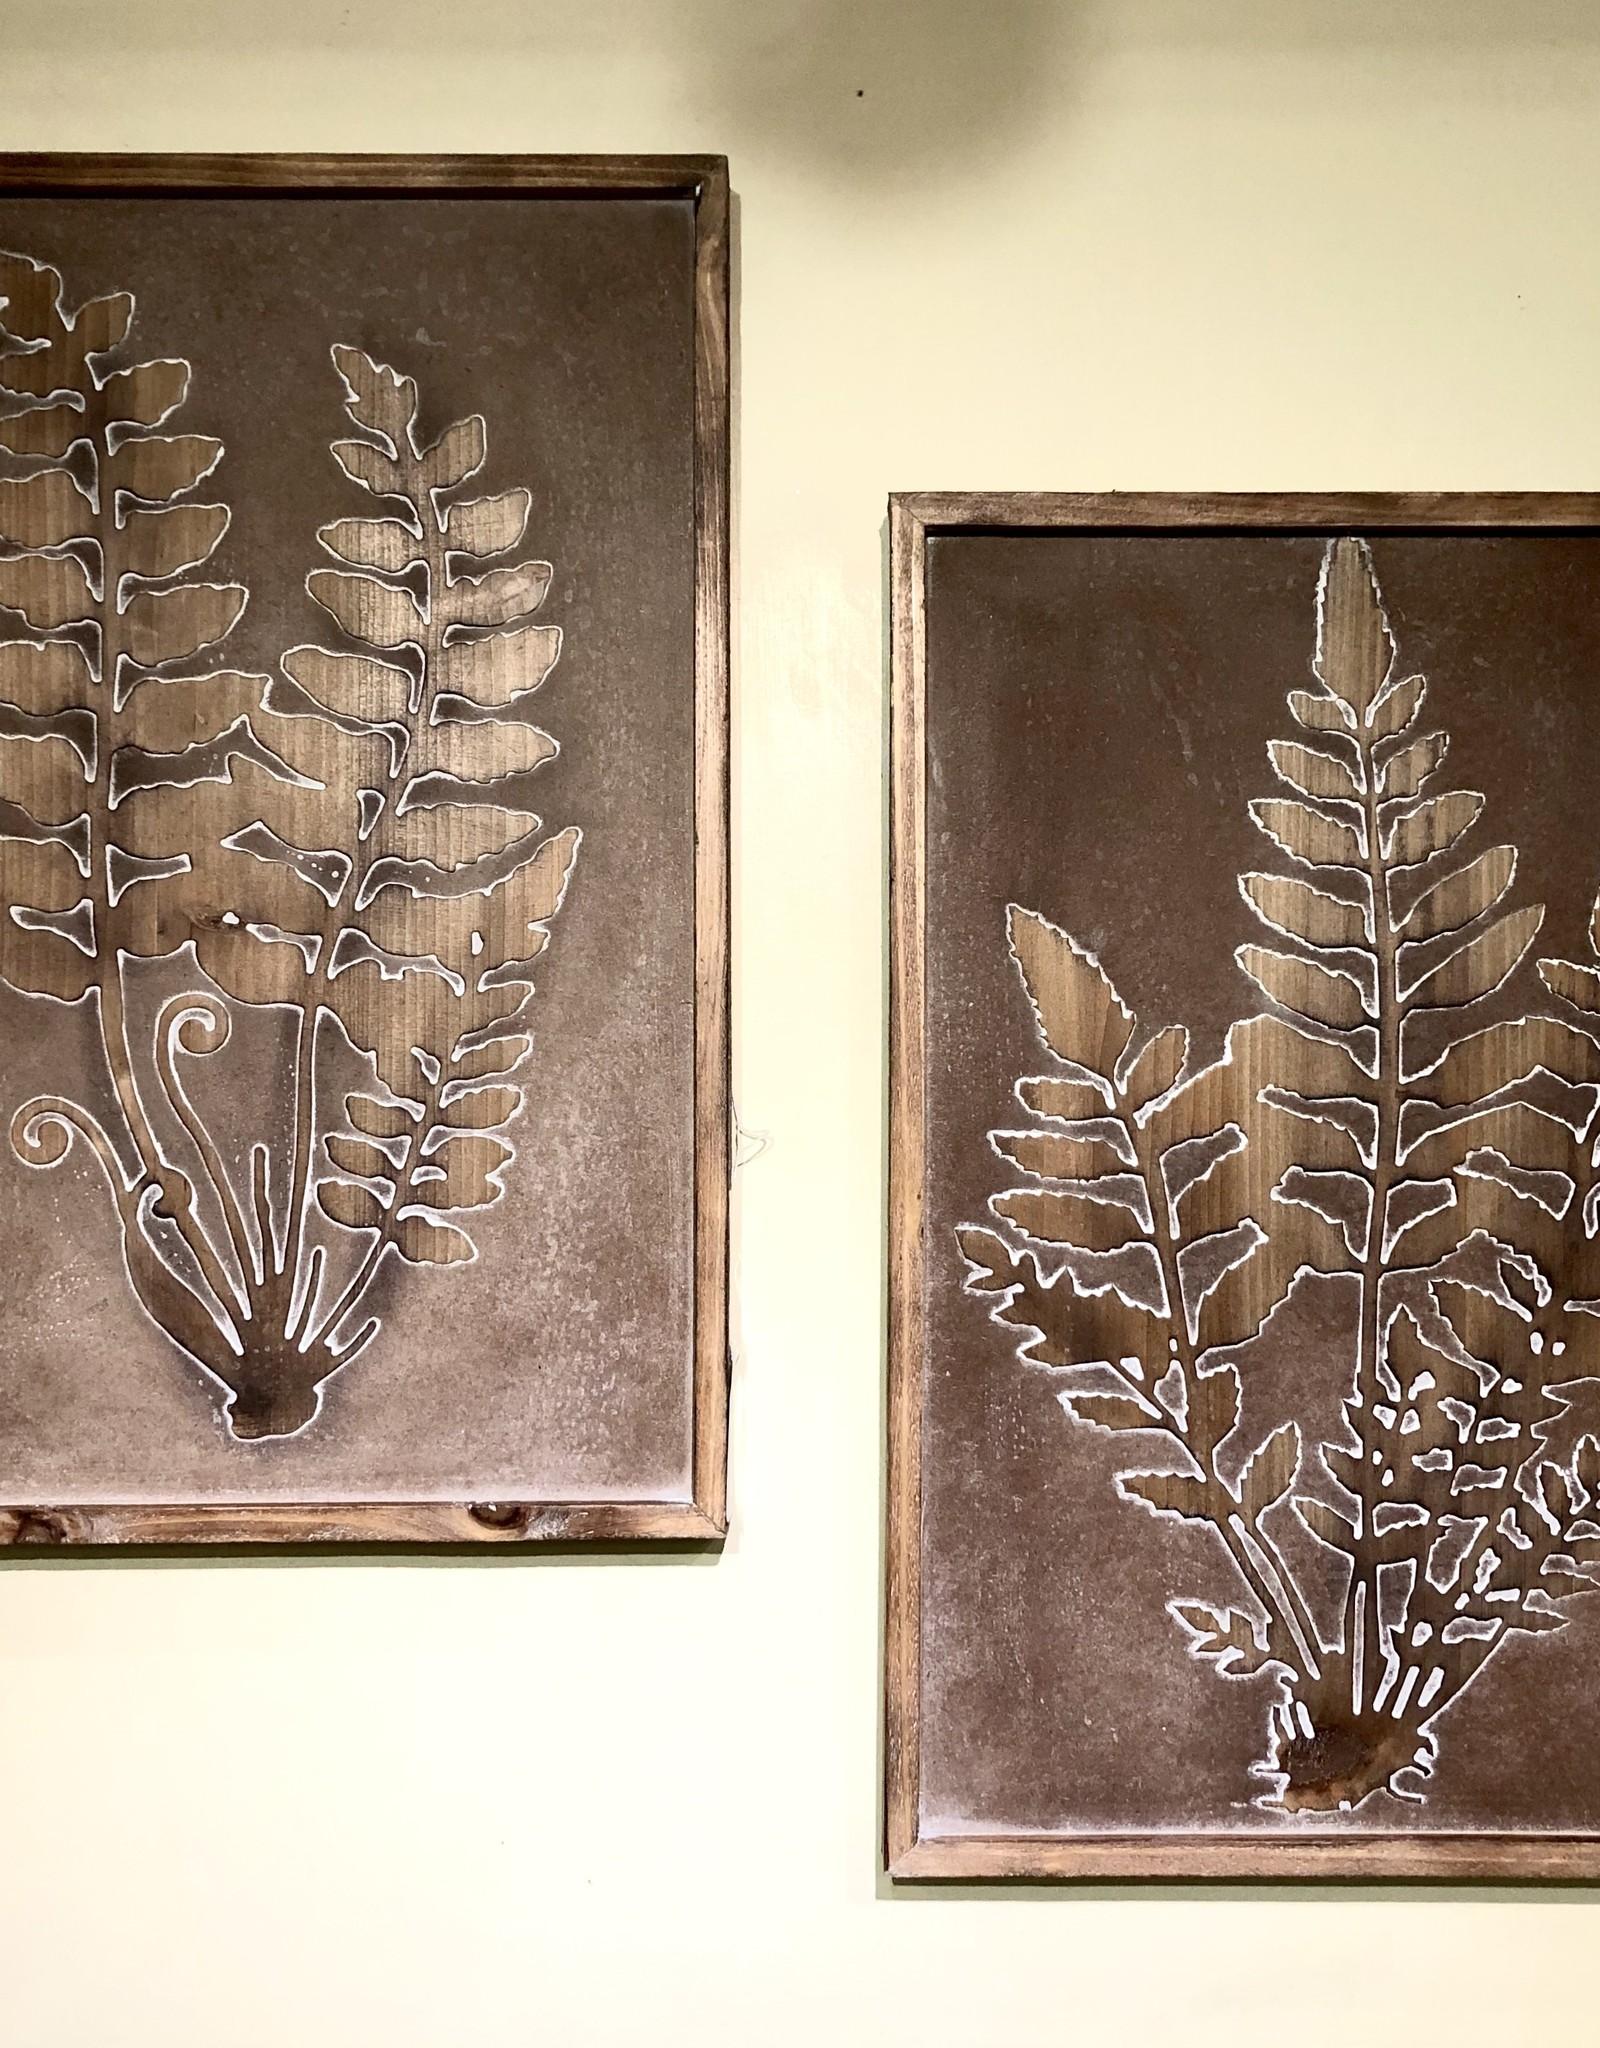 Rustic Fern Carving